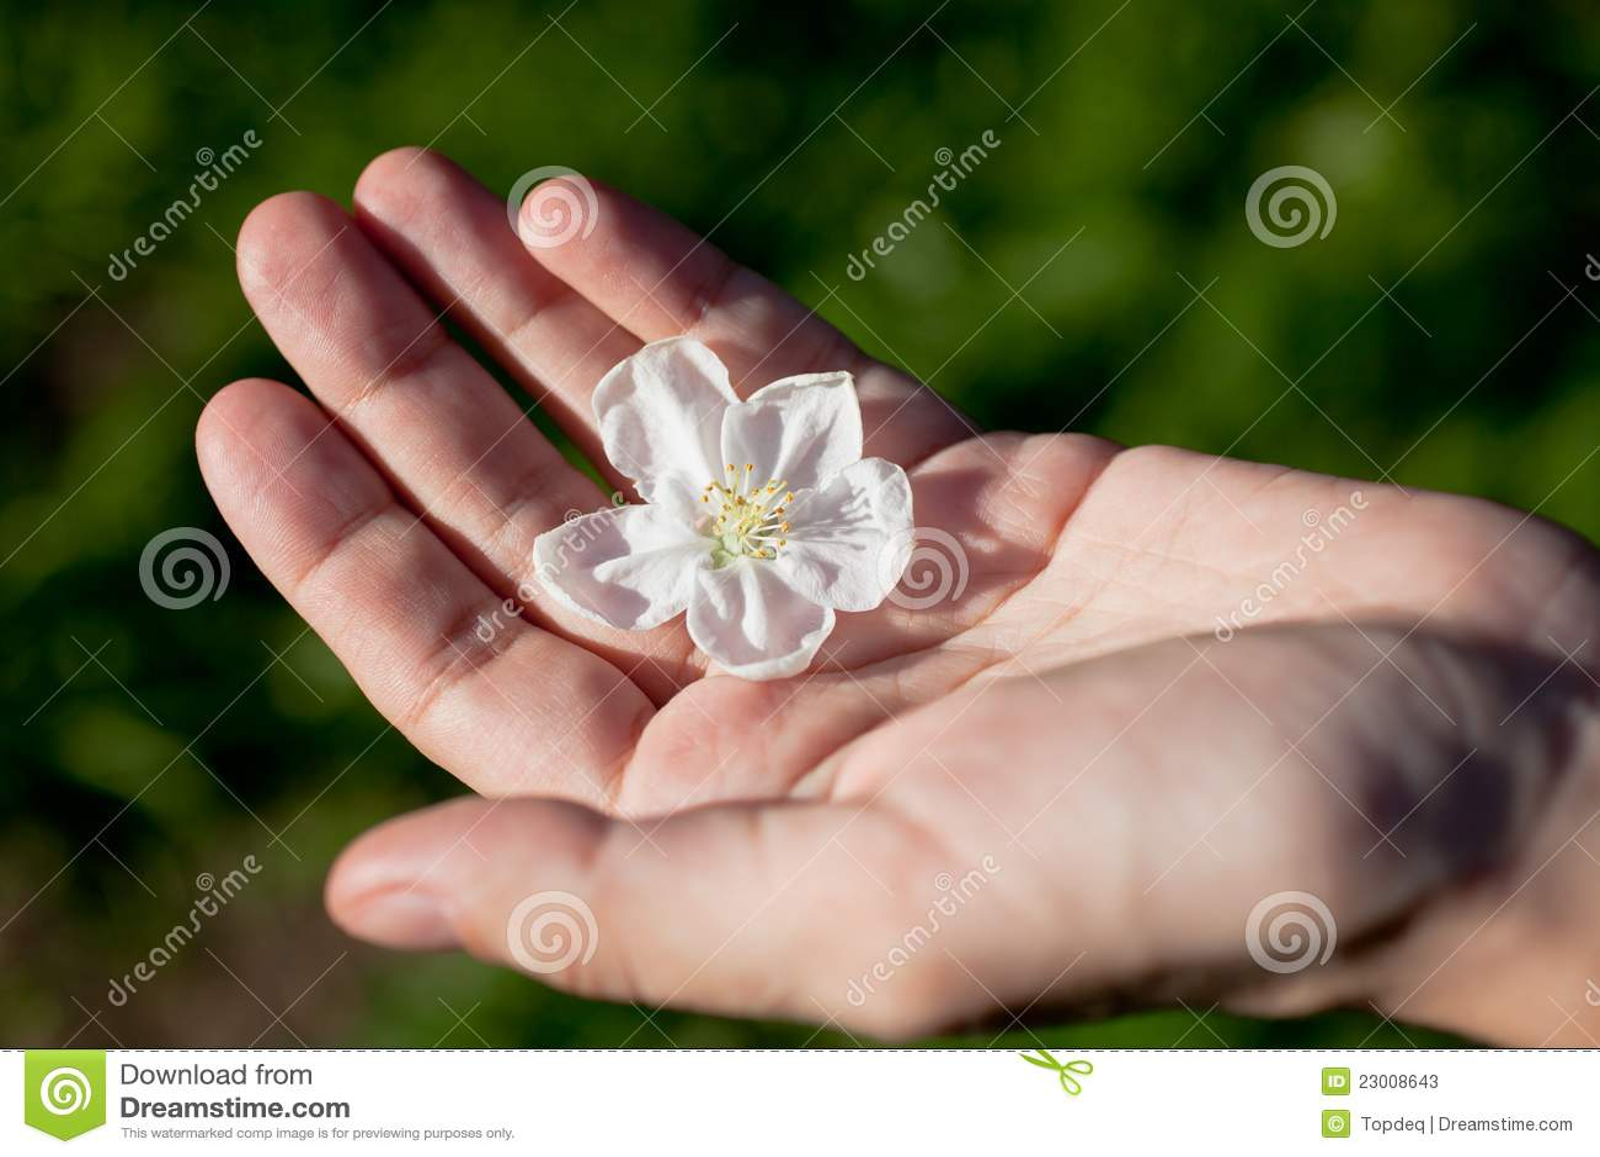 Фото цветка на ладони